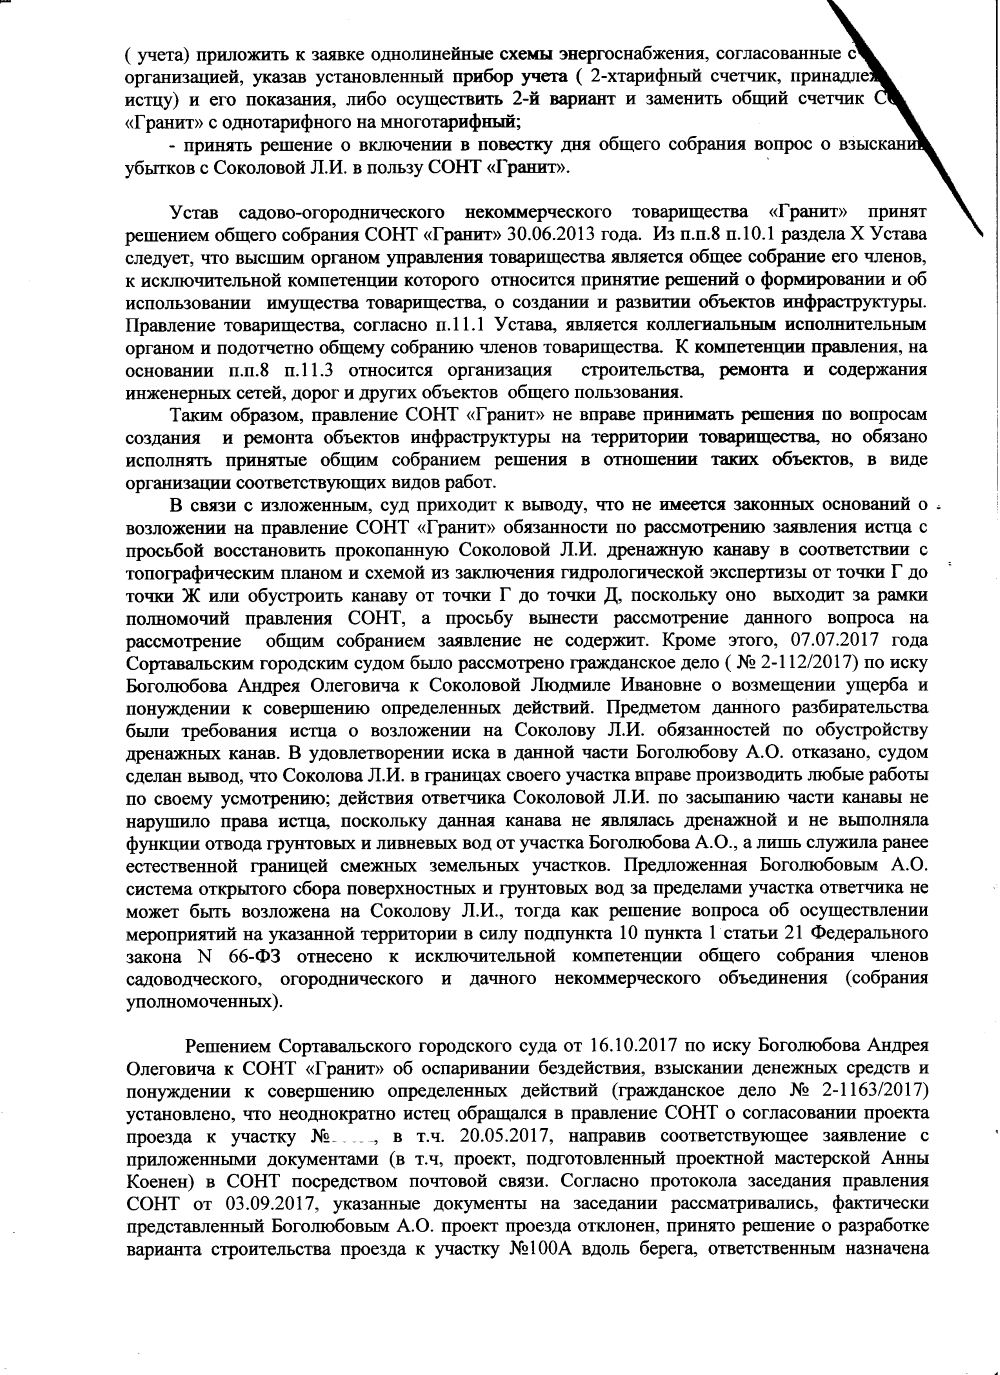 https://sontgranit.ru/forum/img/sokol/20180510-решение-04.png